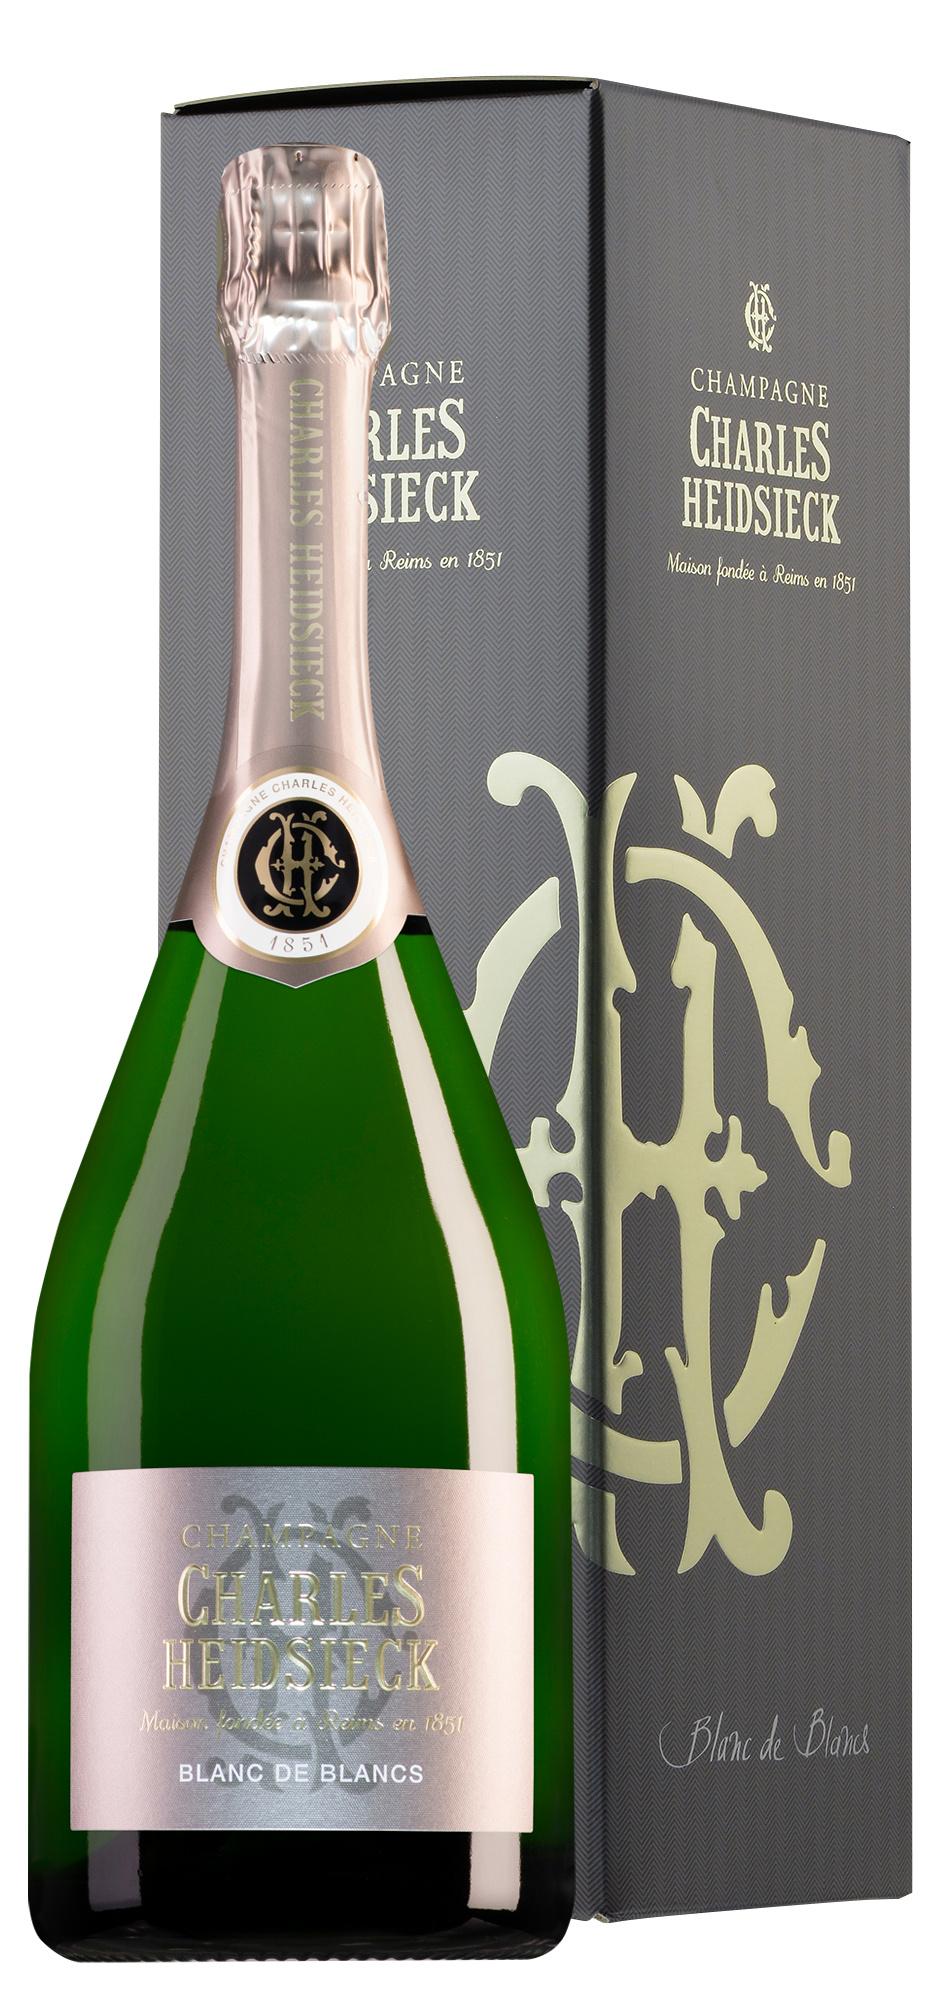 Charles Heidsieck Charles Heidsieck Champagner Blanc de Blancs in Geschenkbox